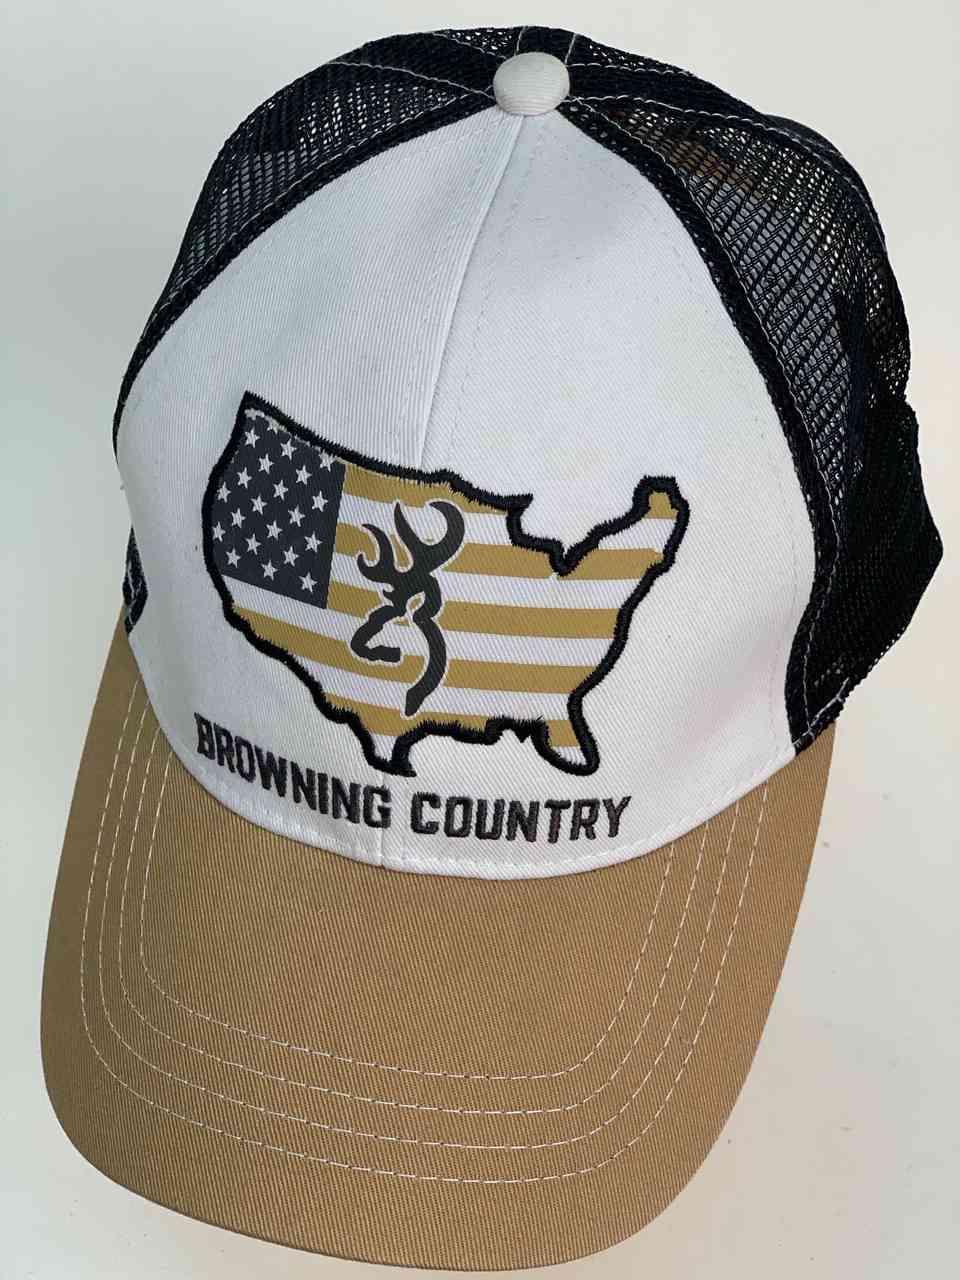 Кепка Browning Country с американским флагом